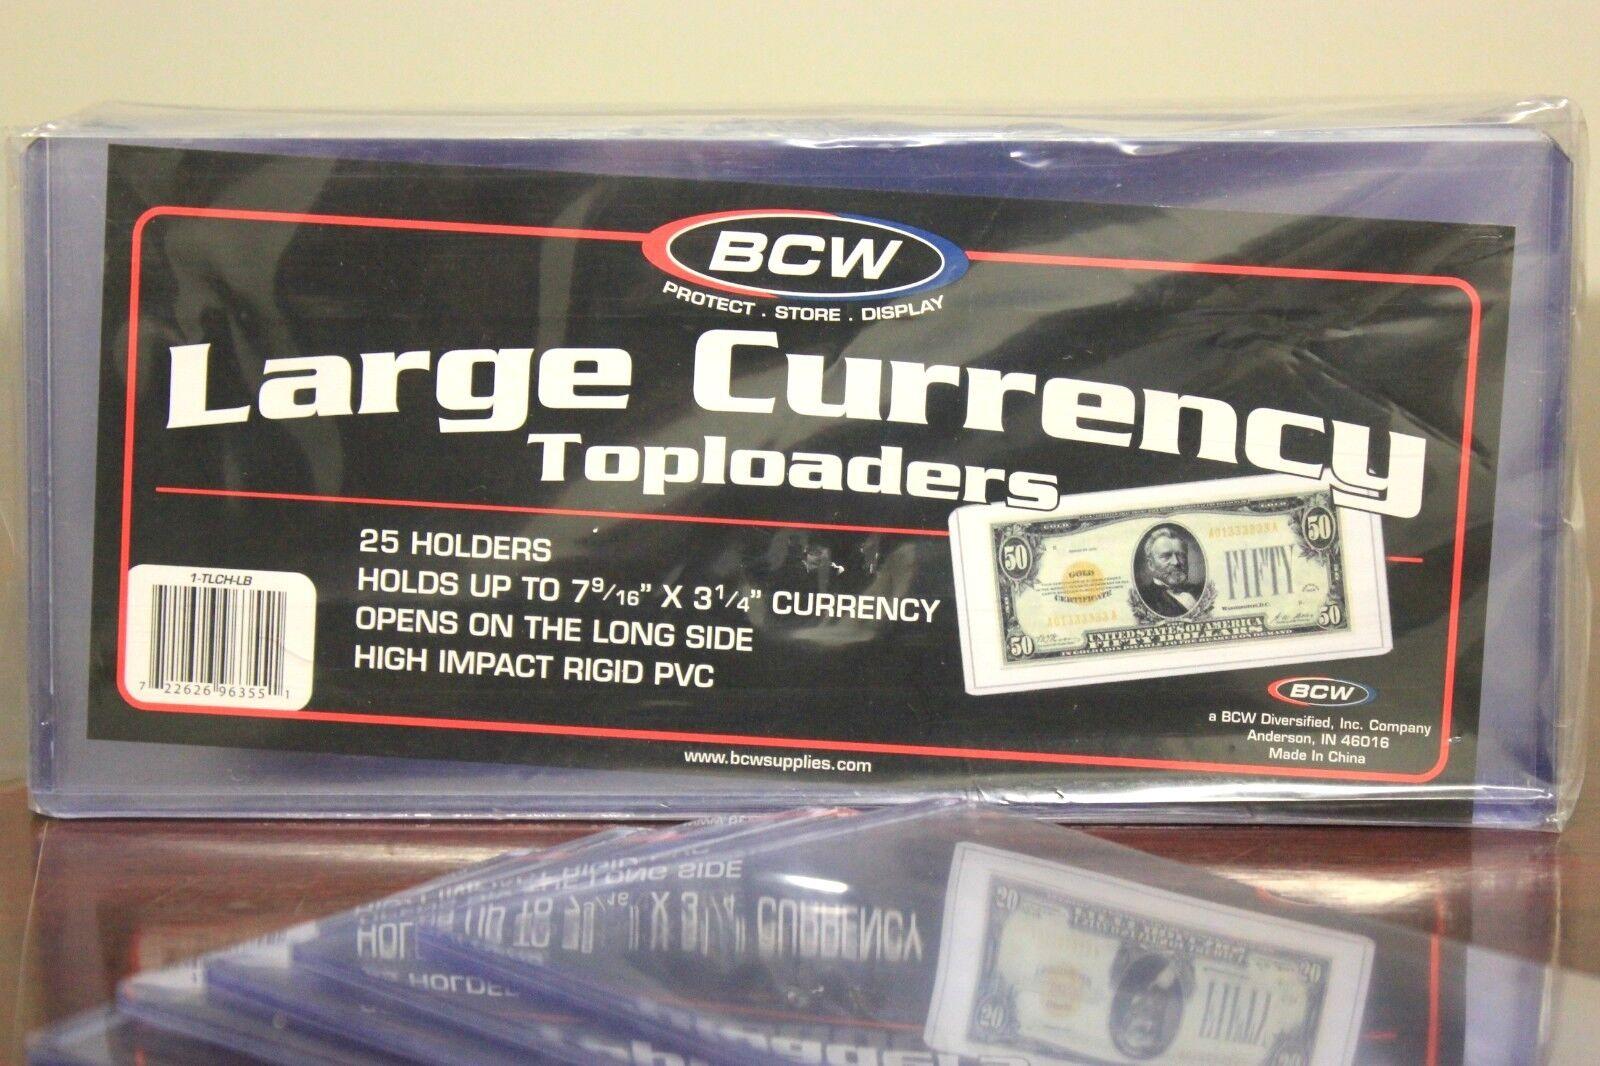 100 New Large Bill Top loader Currency Rigid Dollar Holder Storage QTY 100